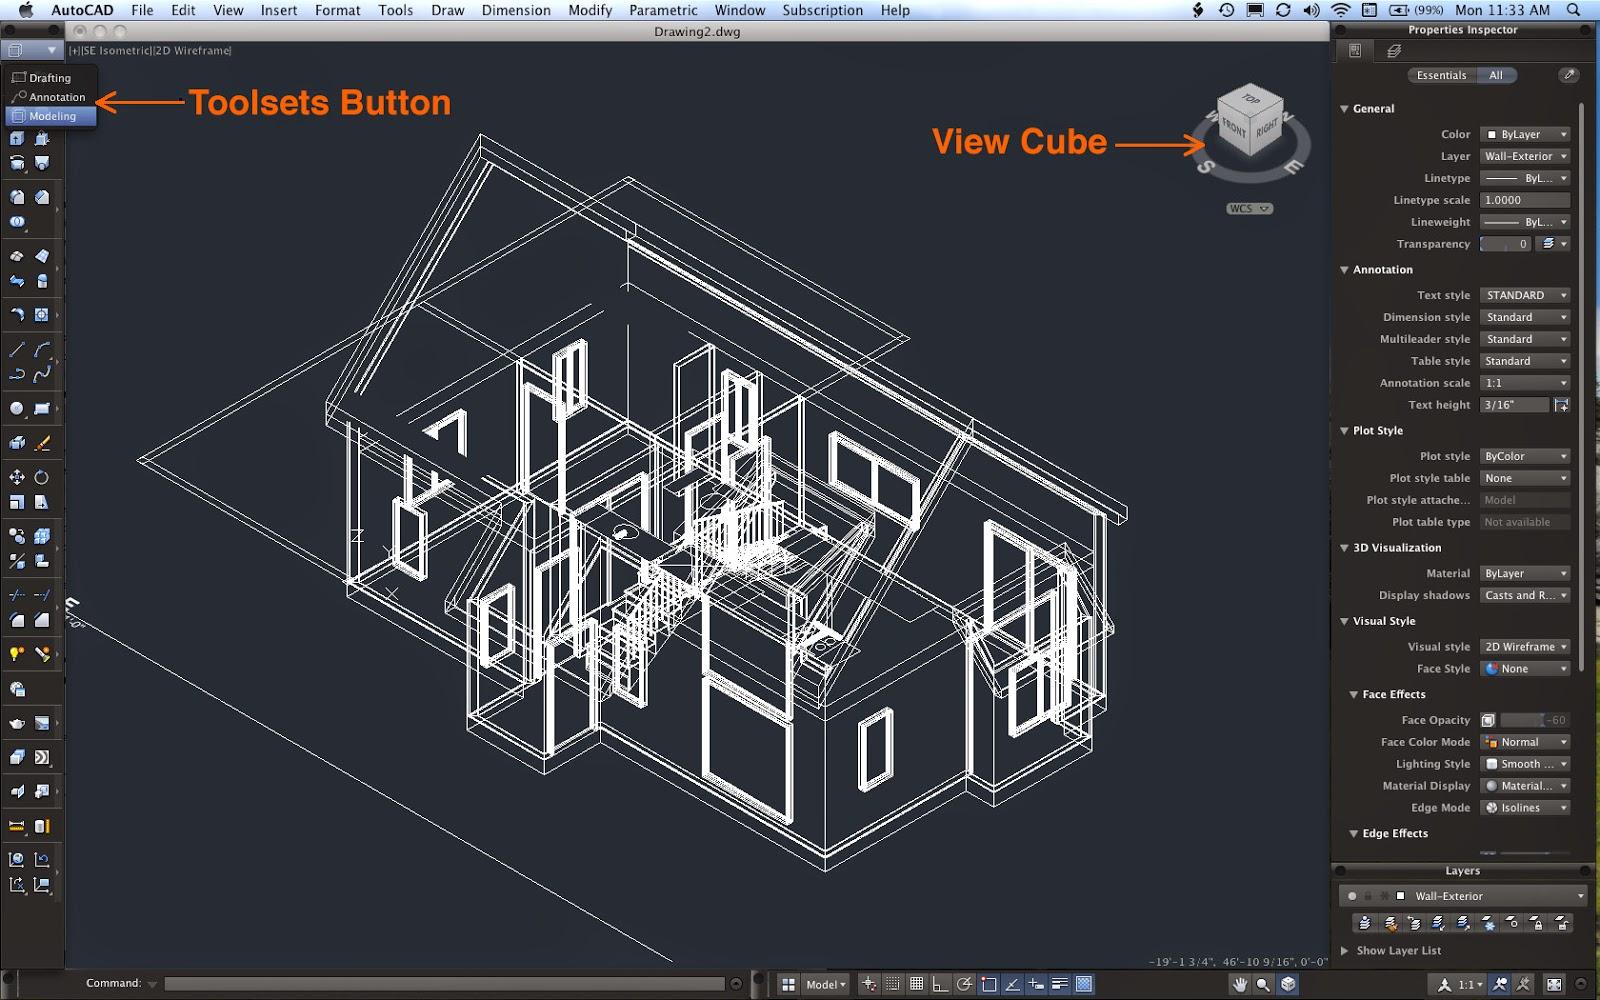 62 Desain Rumah Minimalis Format Autocad Desain Rumah Minimalis